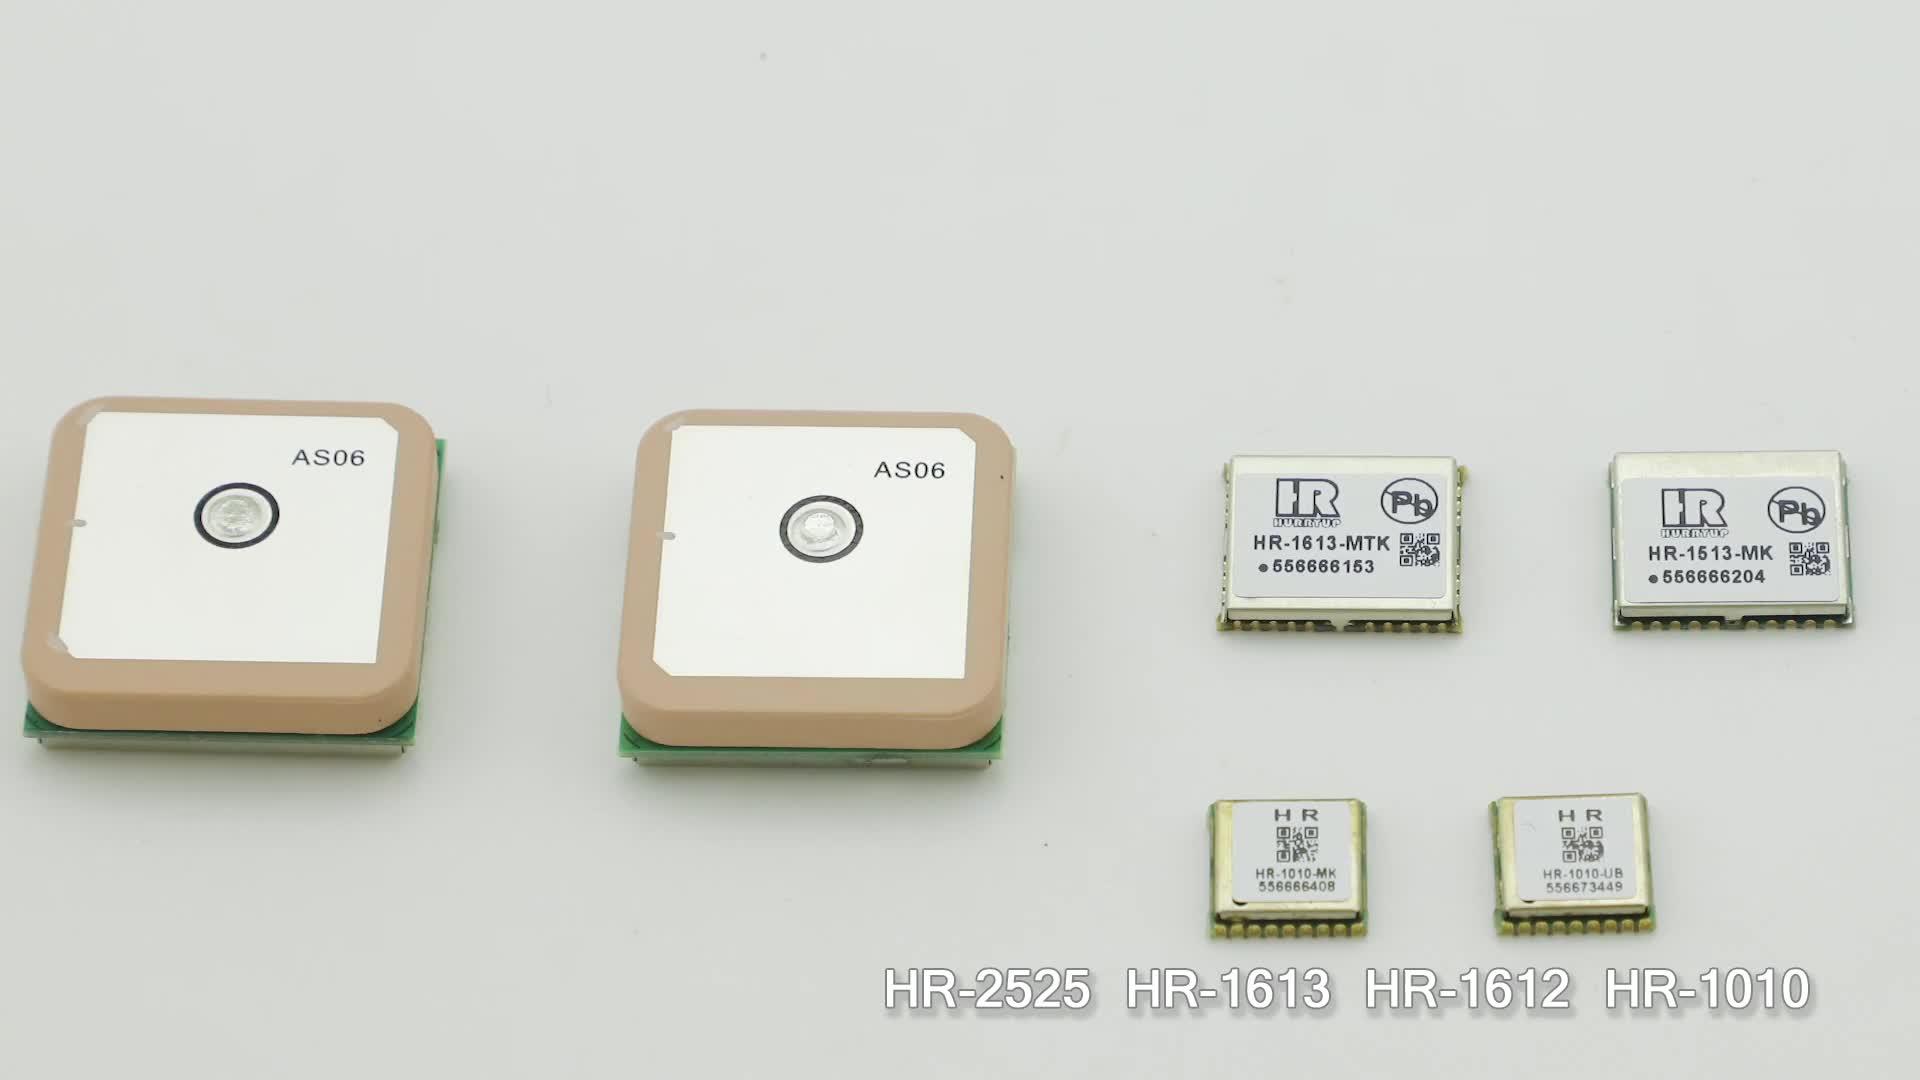 High Accuracy Cheap UVA DVR Digital Video Recording Car Tracker Marine NMEA 0183 MT3337 UART/TTL G-Mouse GPS Receiver Module